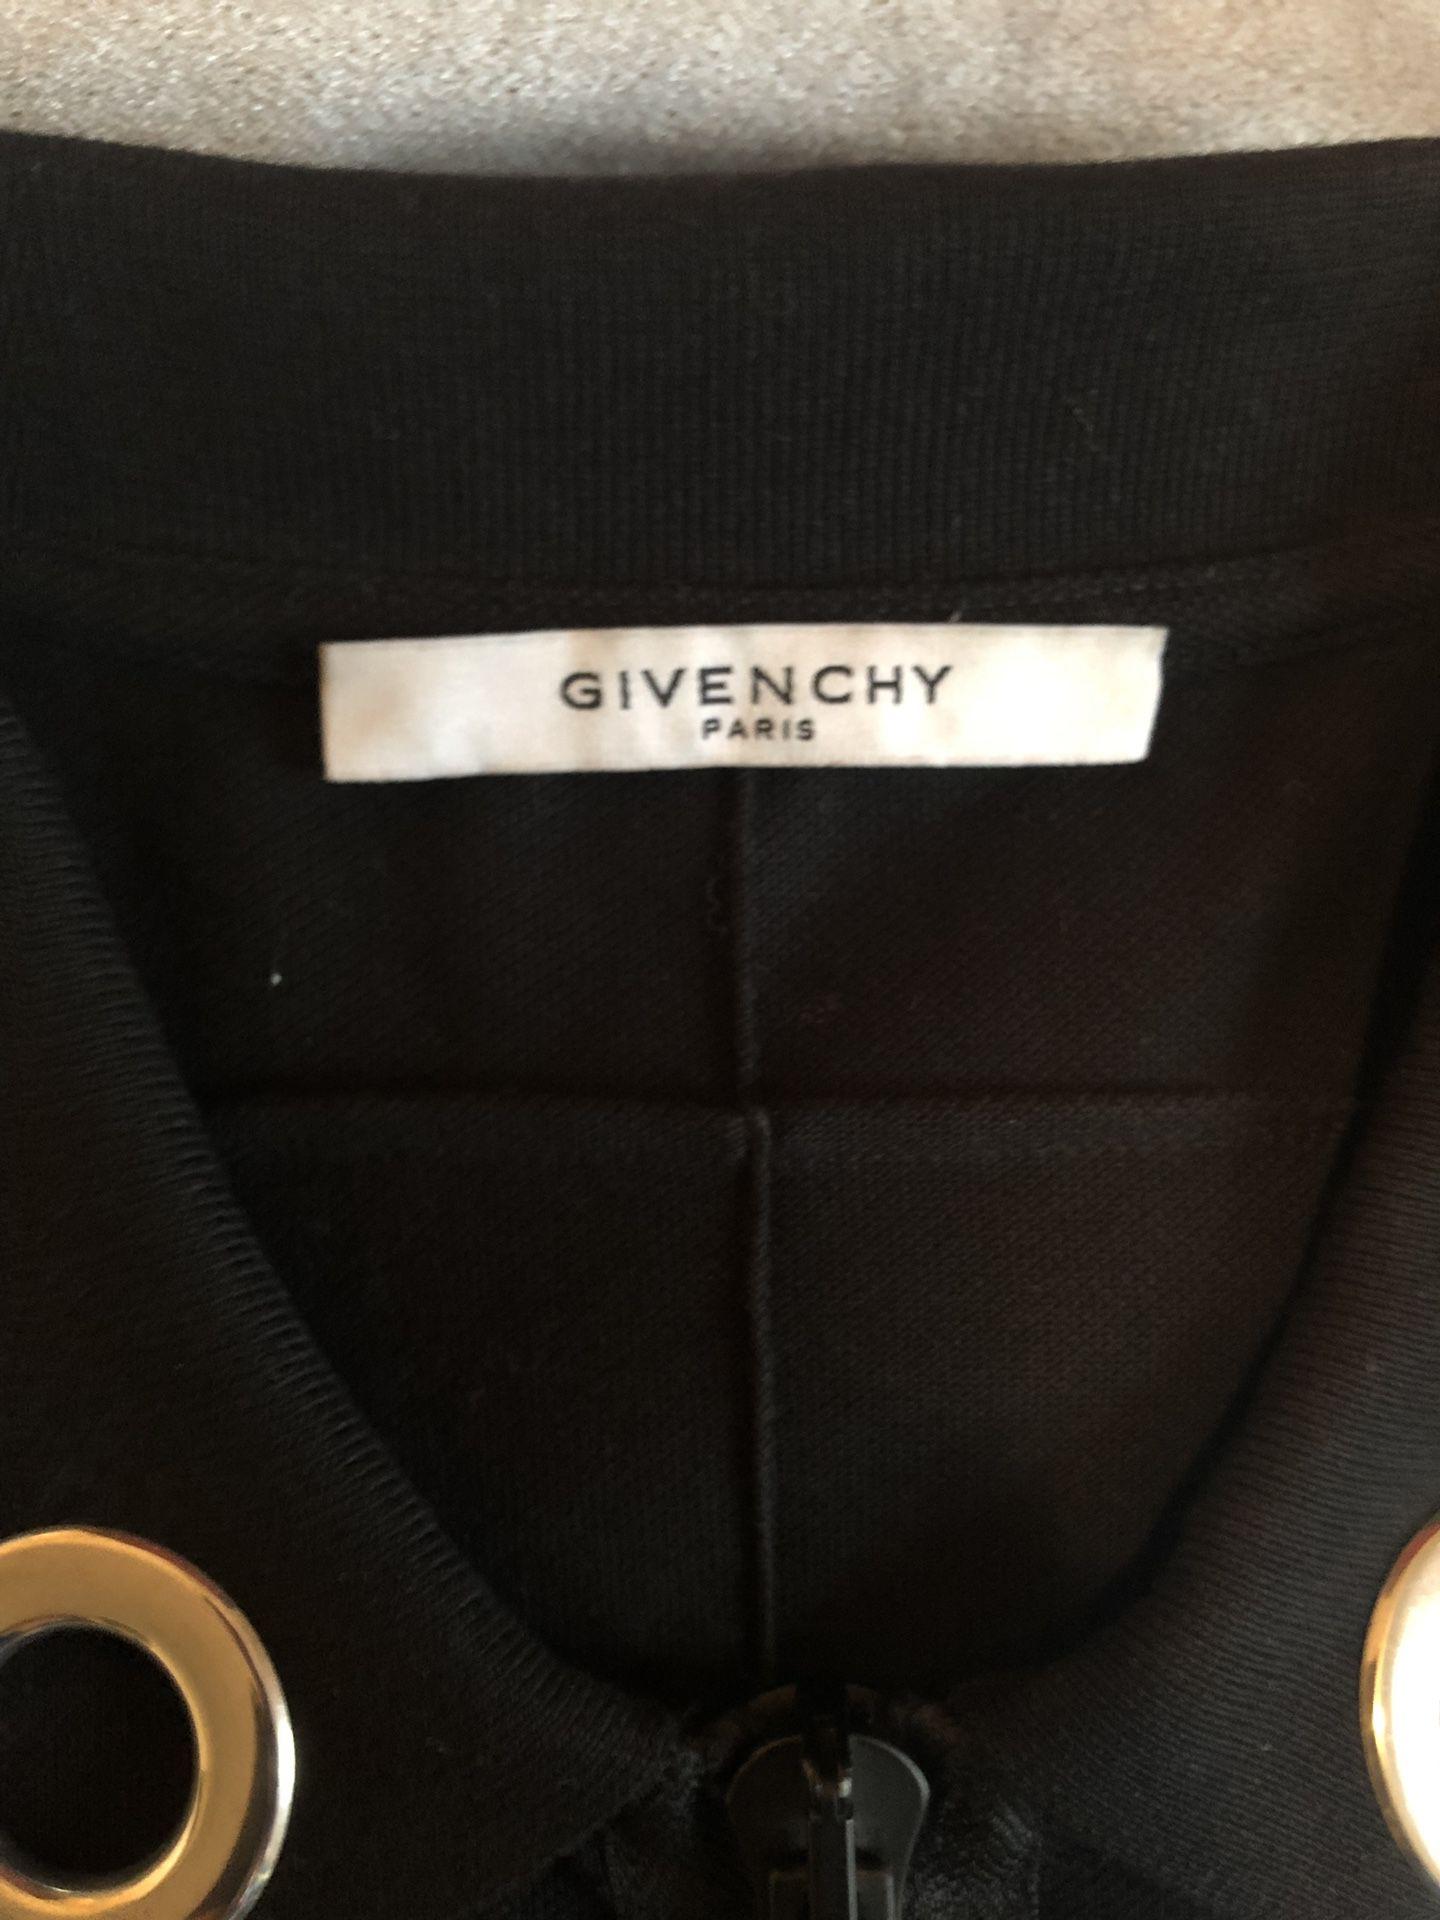 Givenchy collar shirt for men